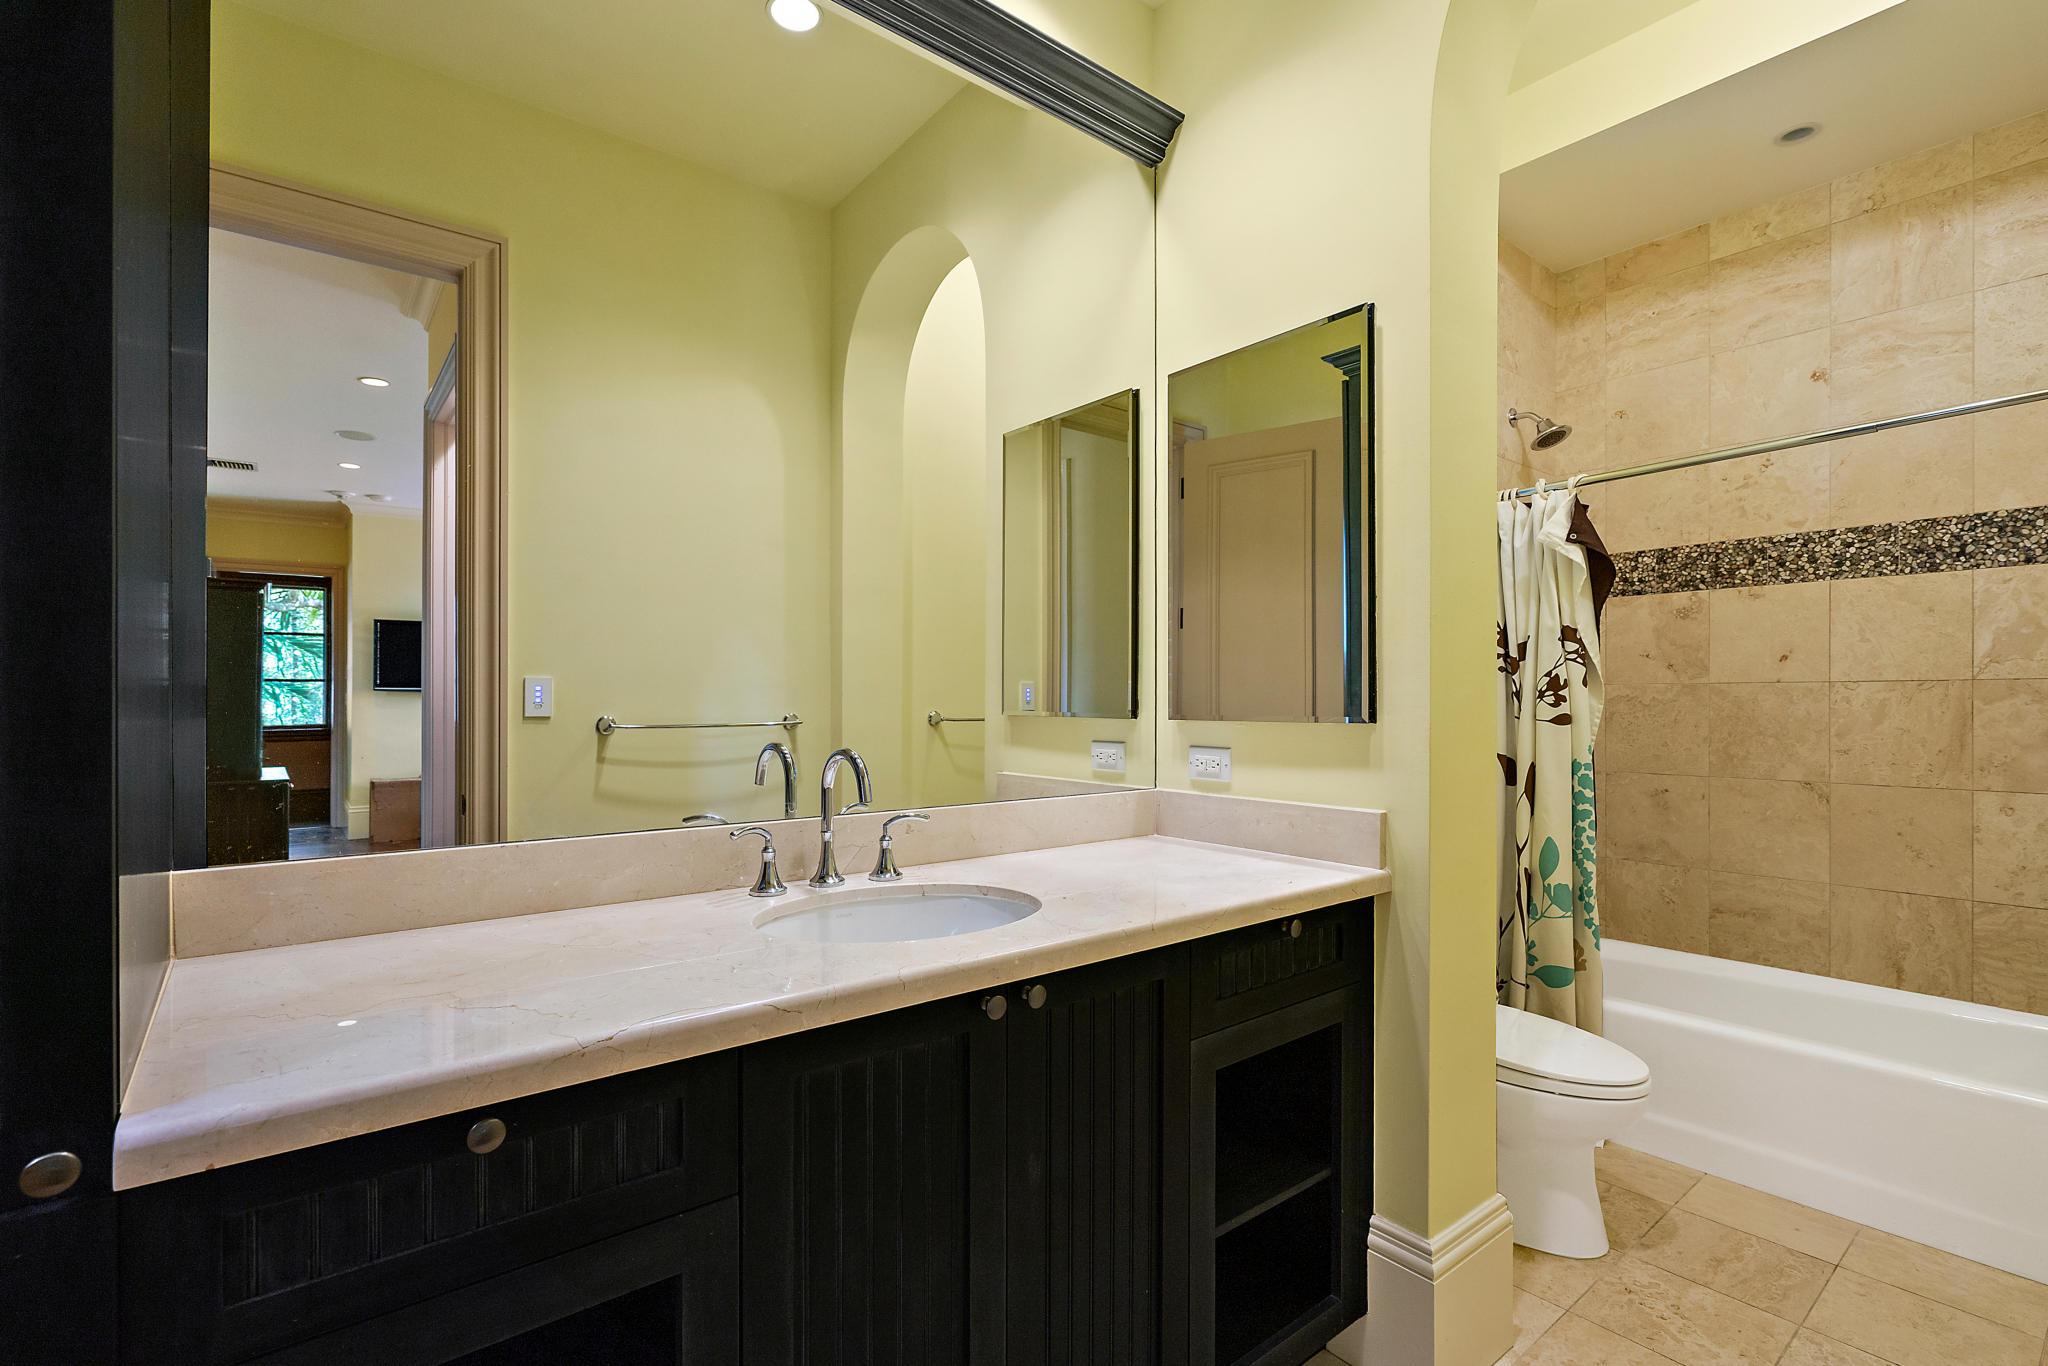 guest house bathroom 1